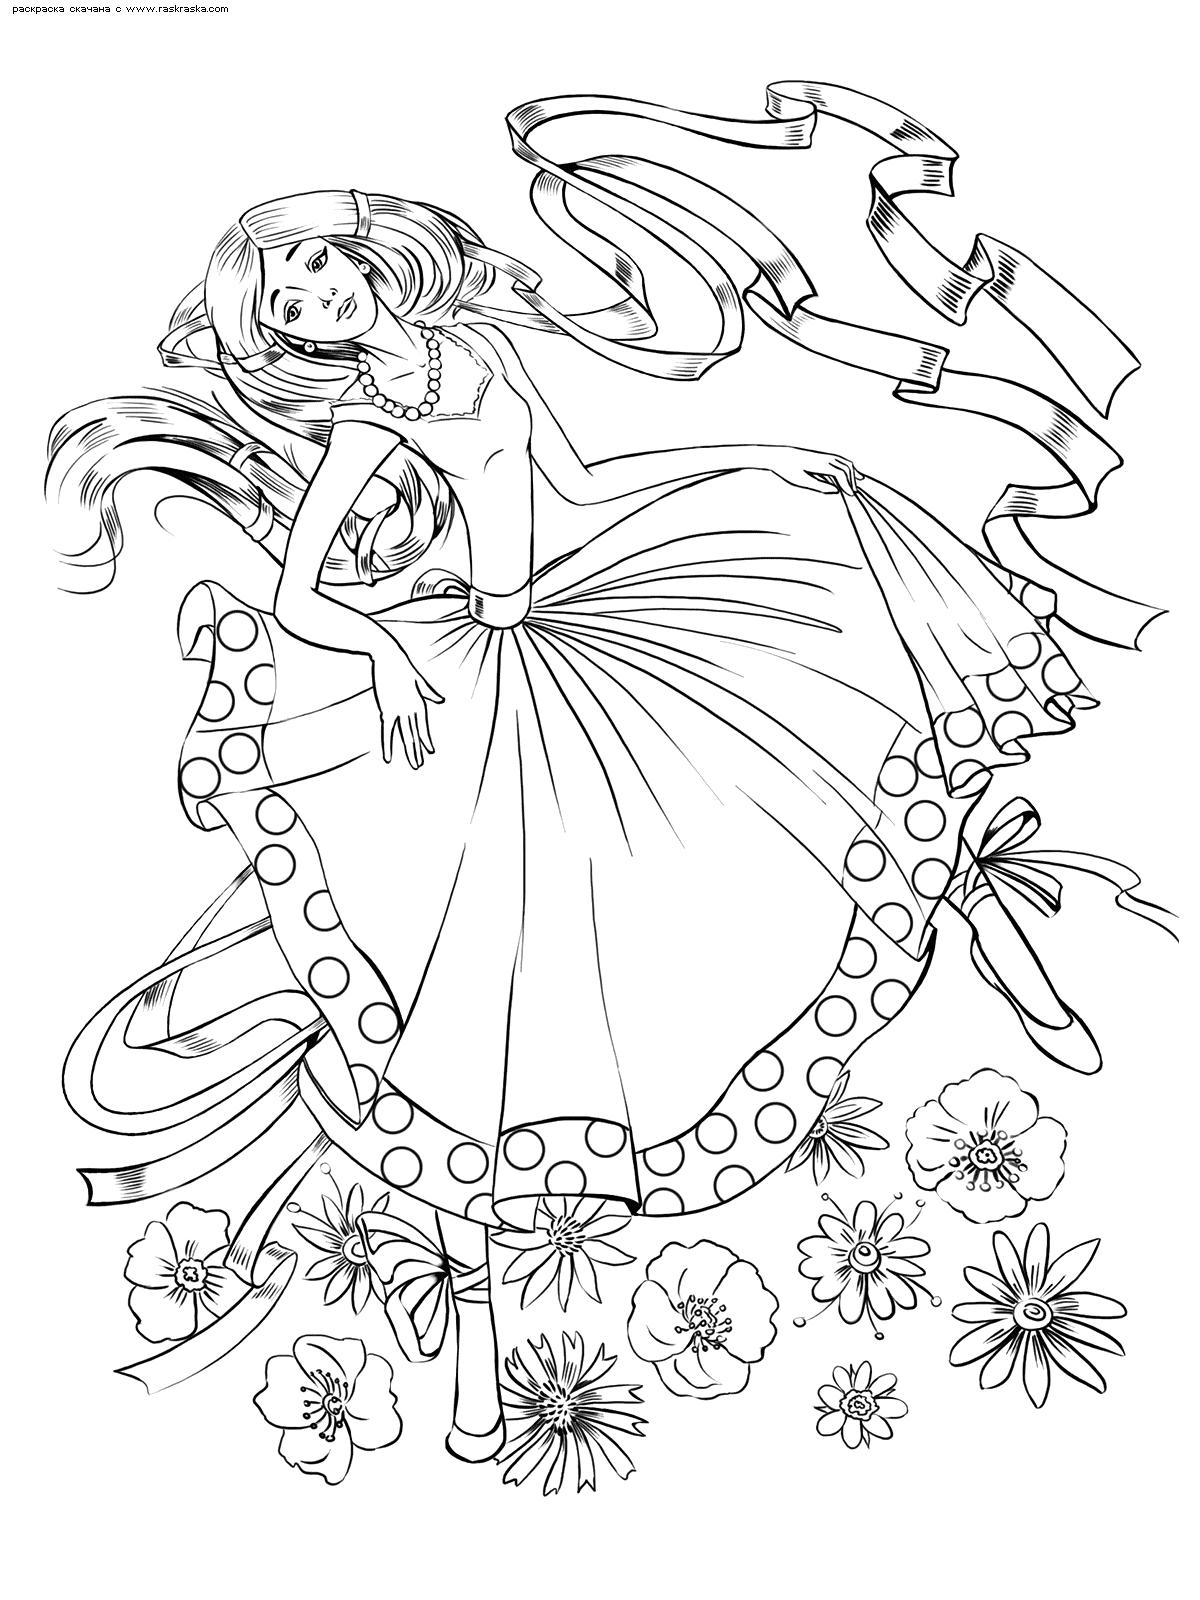 Раскраска Балерина. Раскраска антистресс